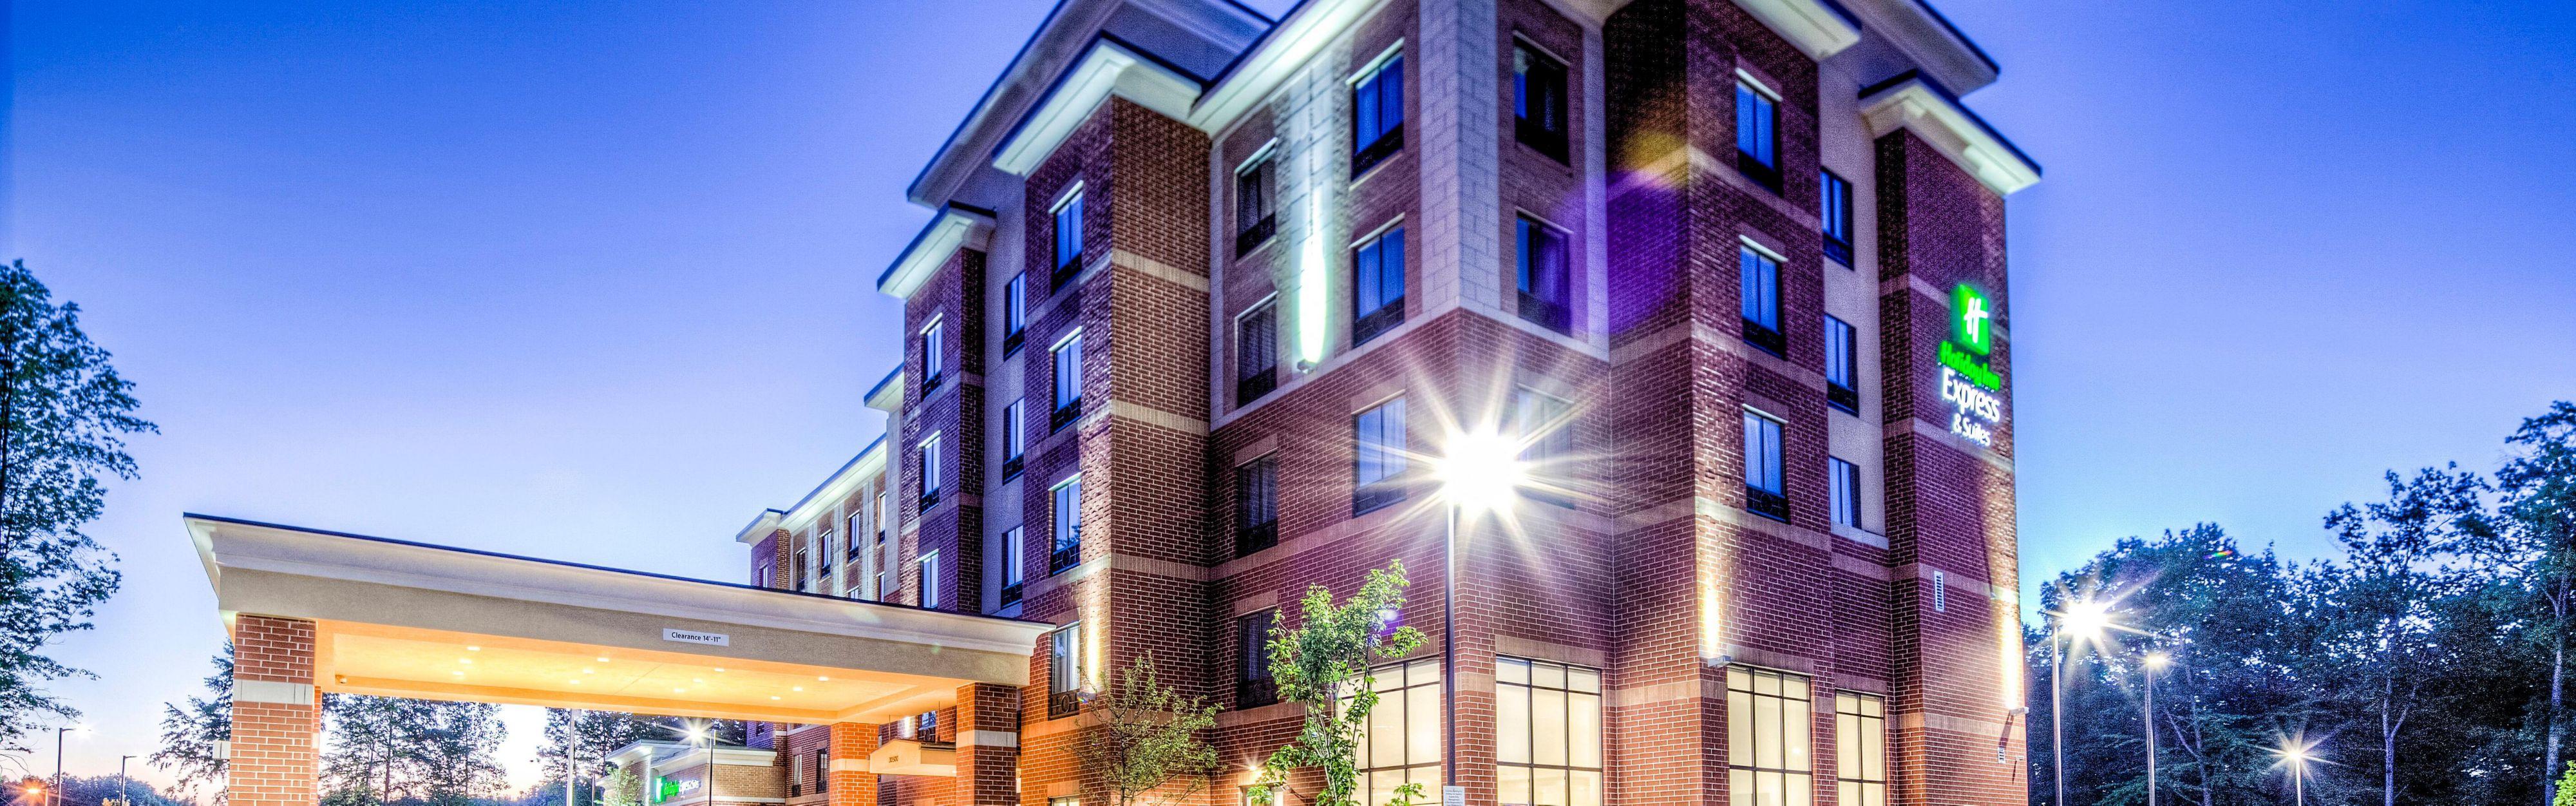 Holiday Inn Express & Suites Cleveland West - Westlake image 0